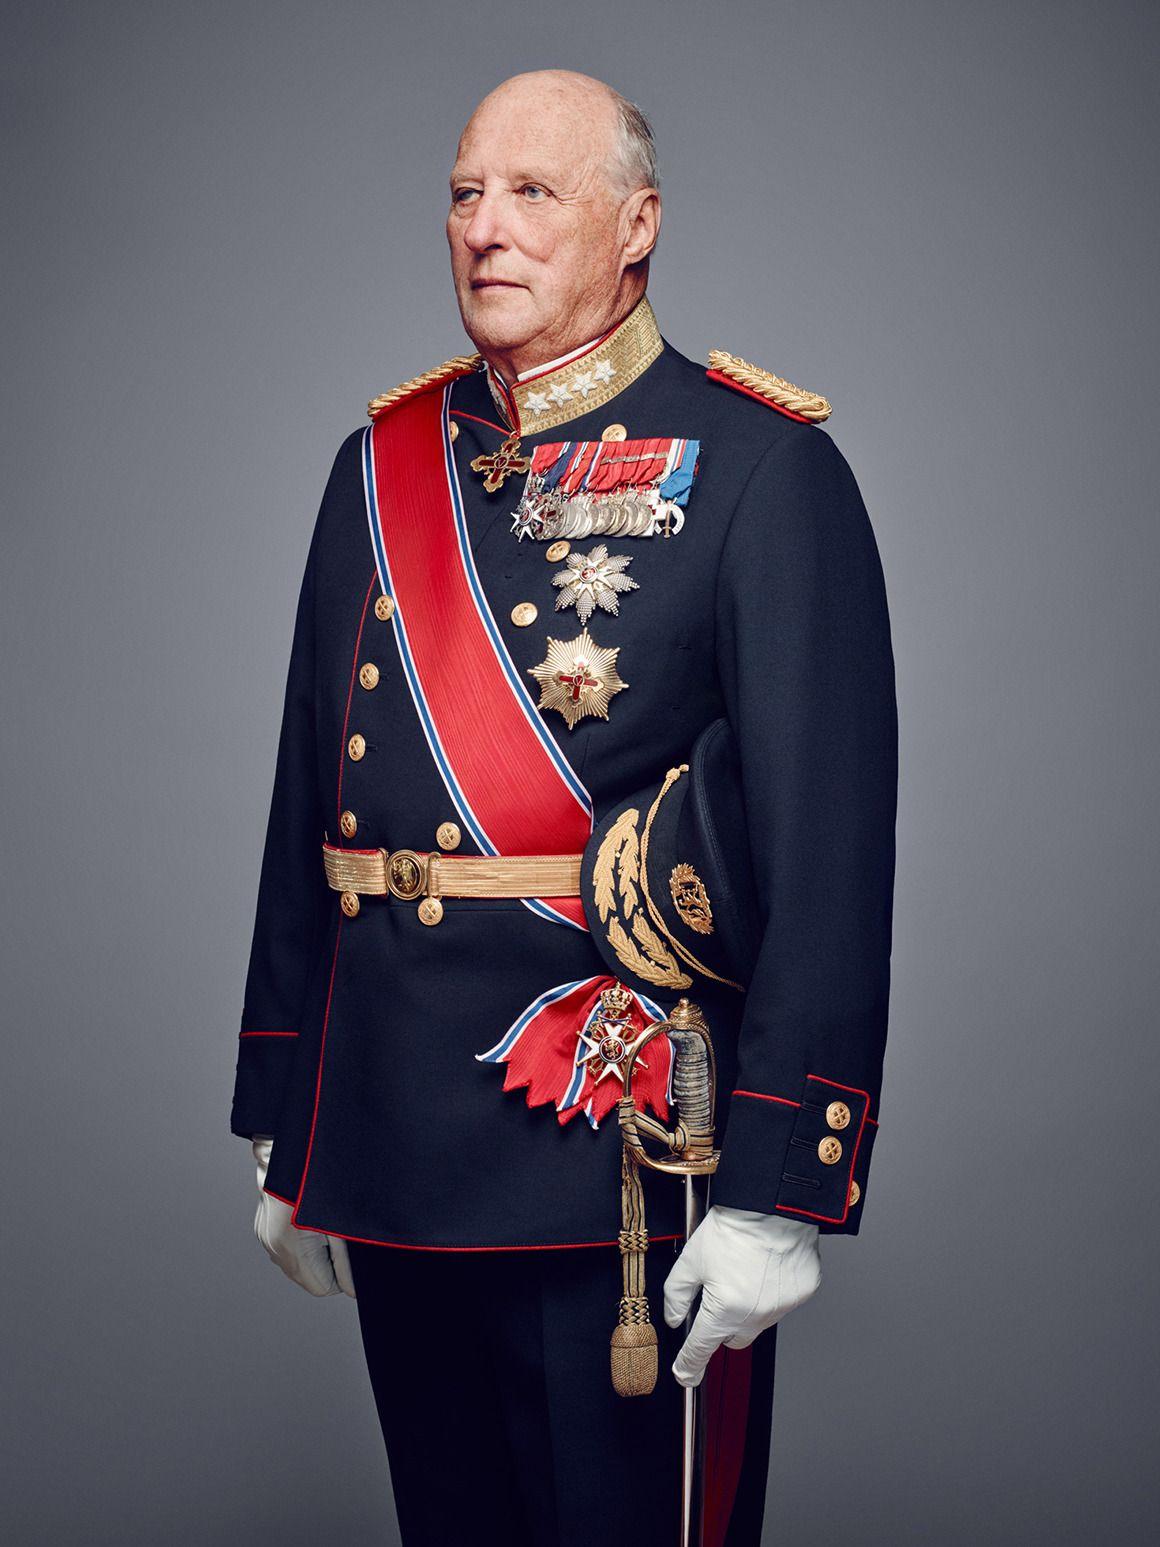 King Herald V   Norwegian royalty, Royal, Royal family